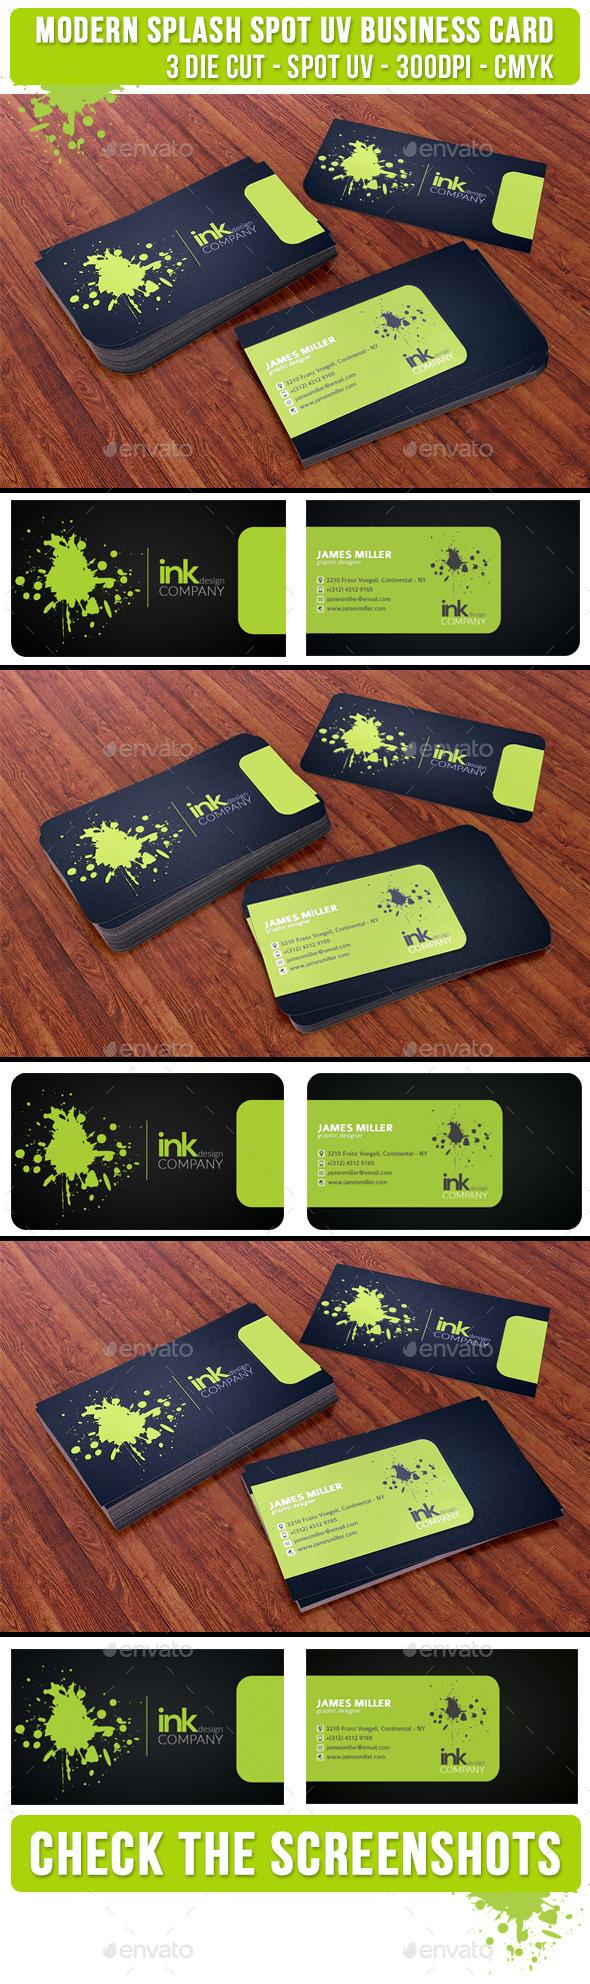 GraphicRiver Splash Ink Spot UV Business Card 3 Cuts 9299727